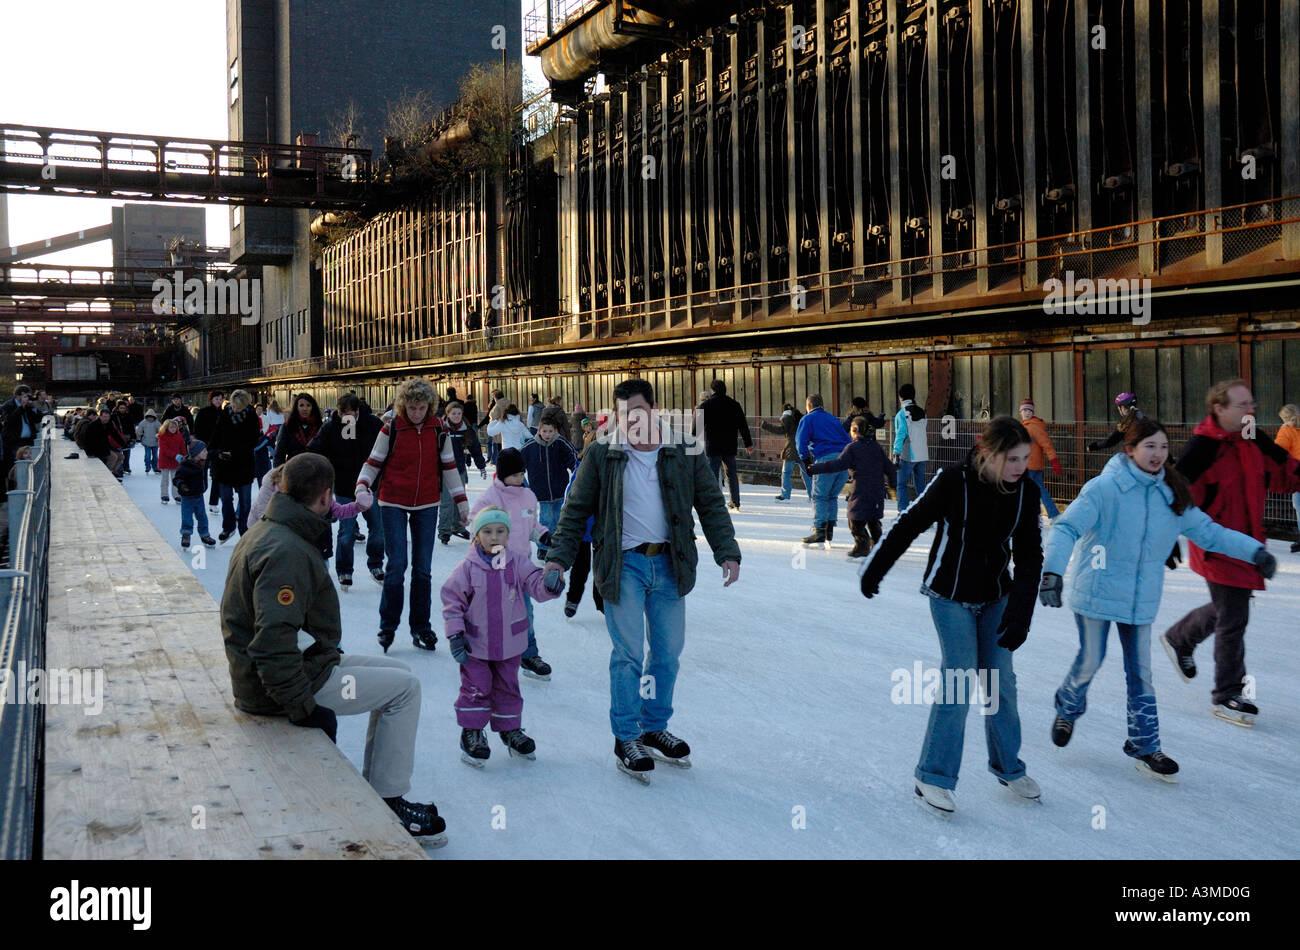 Ice skating at the UNESCO world heritage site Zollverein, Essen, Germany. - Stock Image